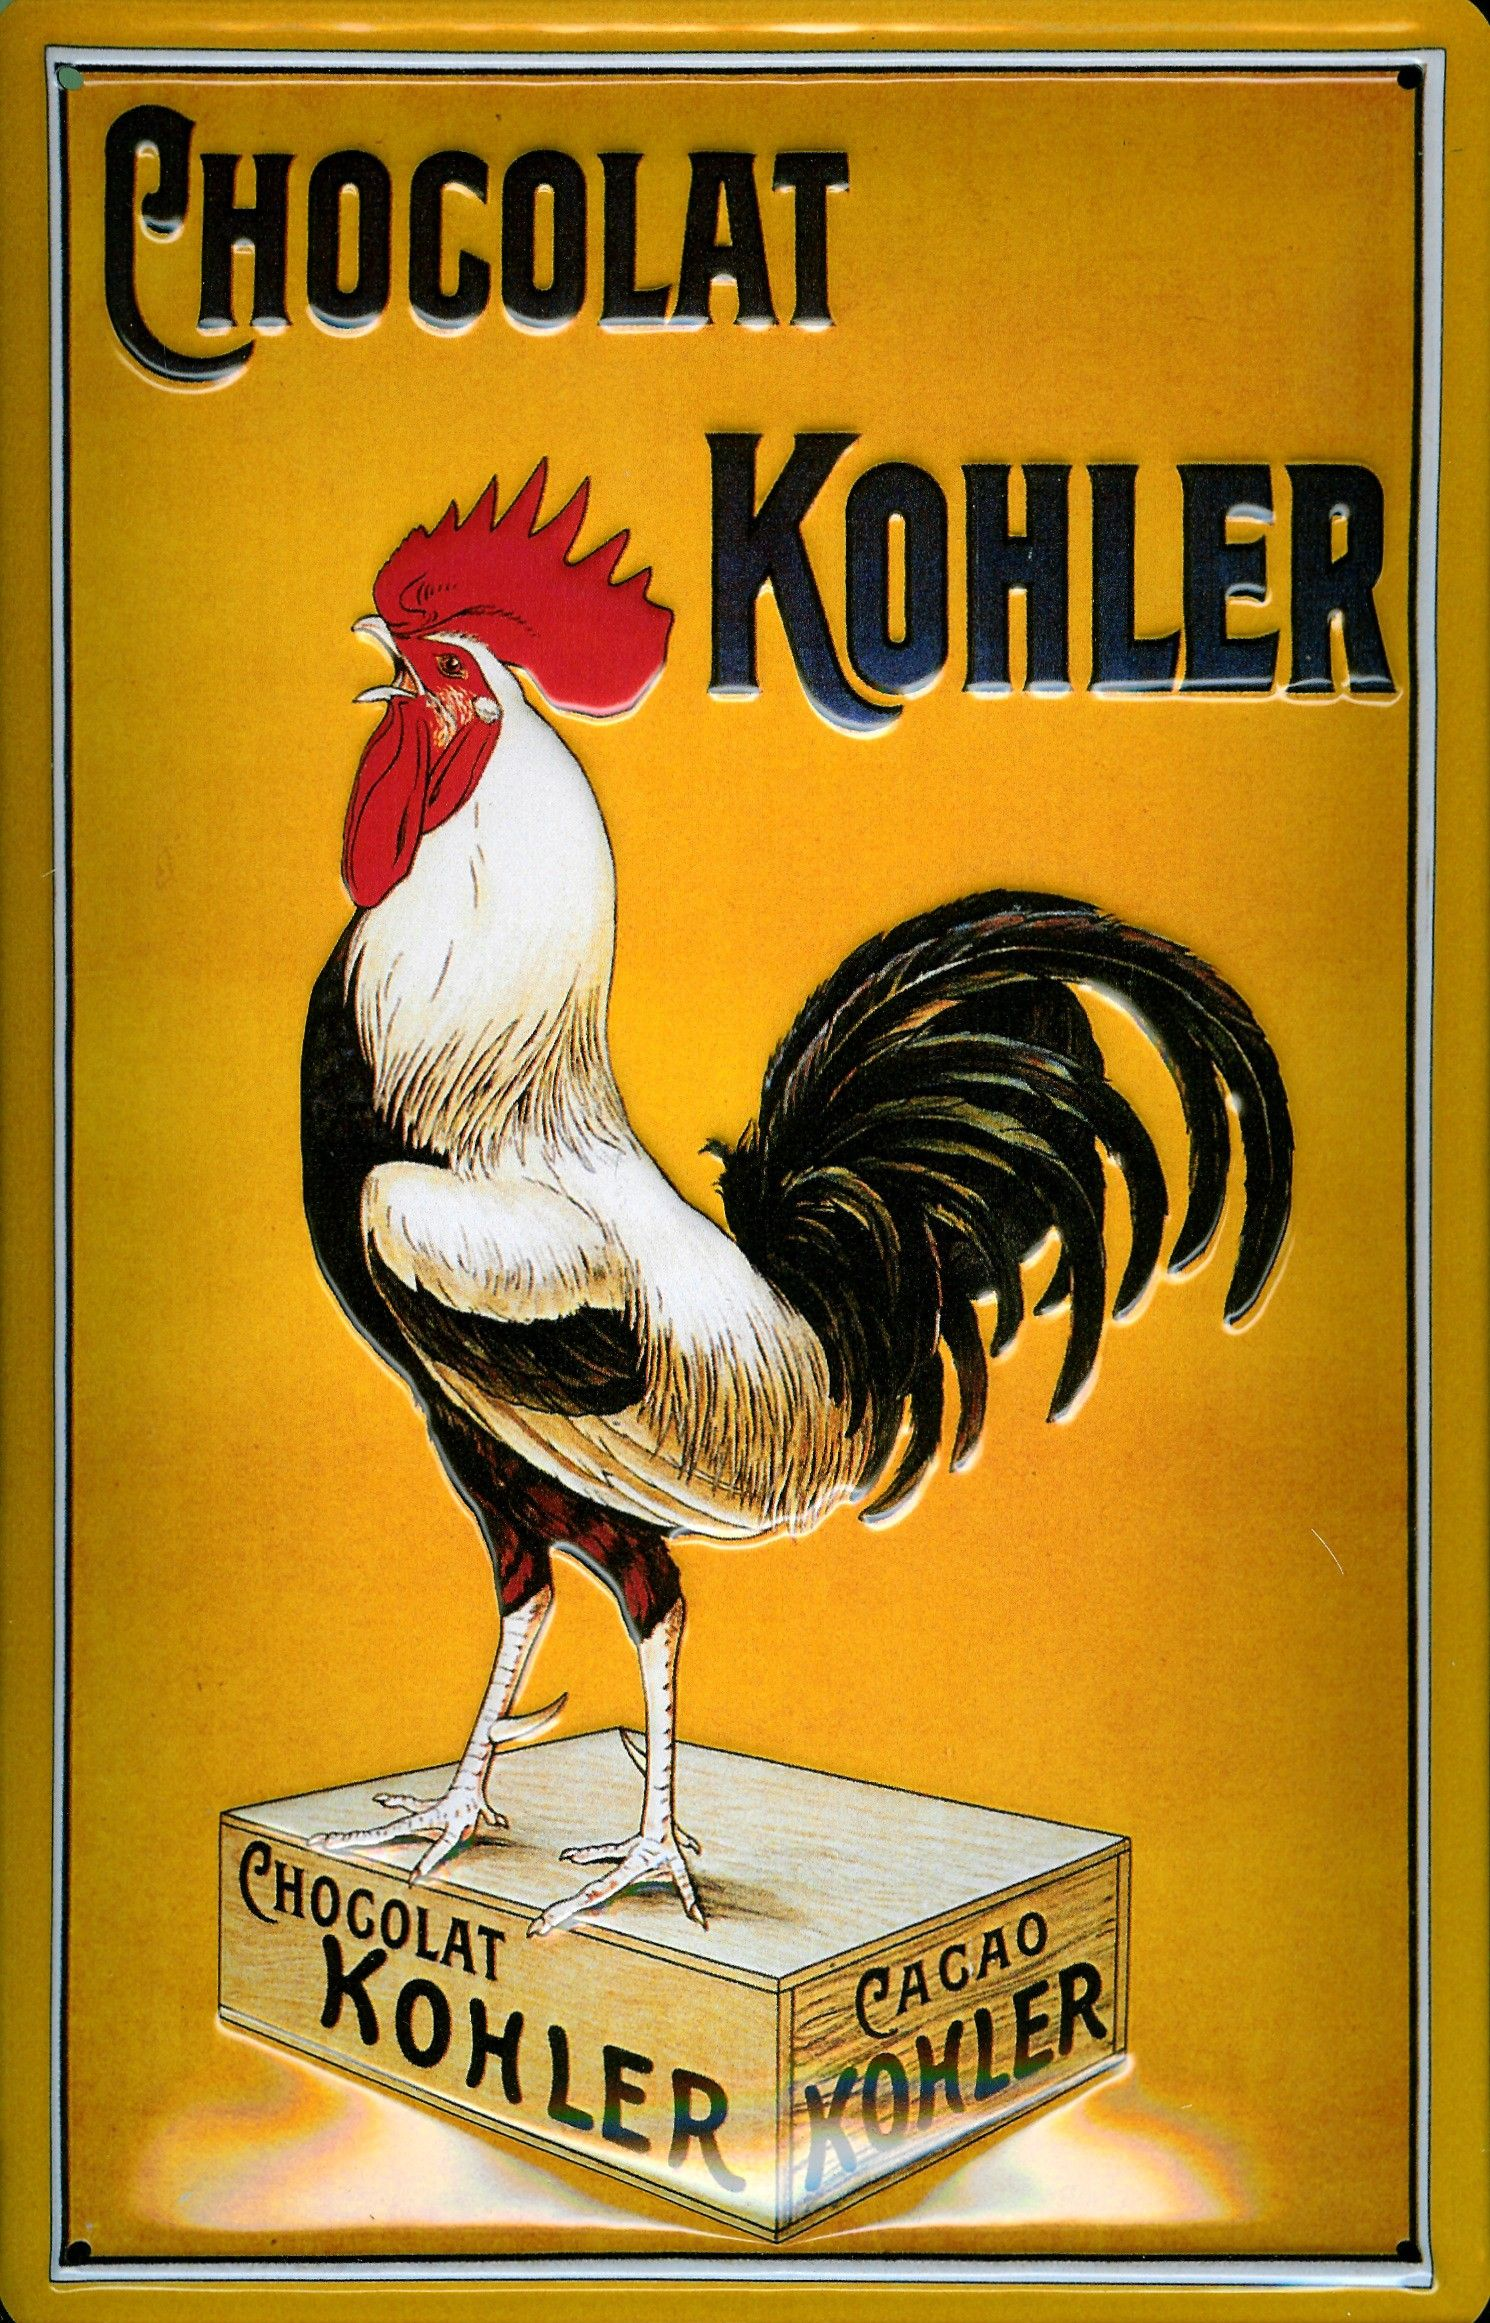 Chocolat Kohler - Chocolate - Food